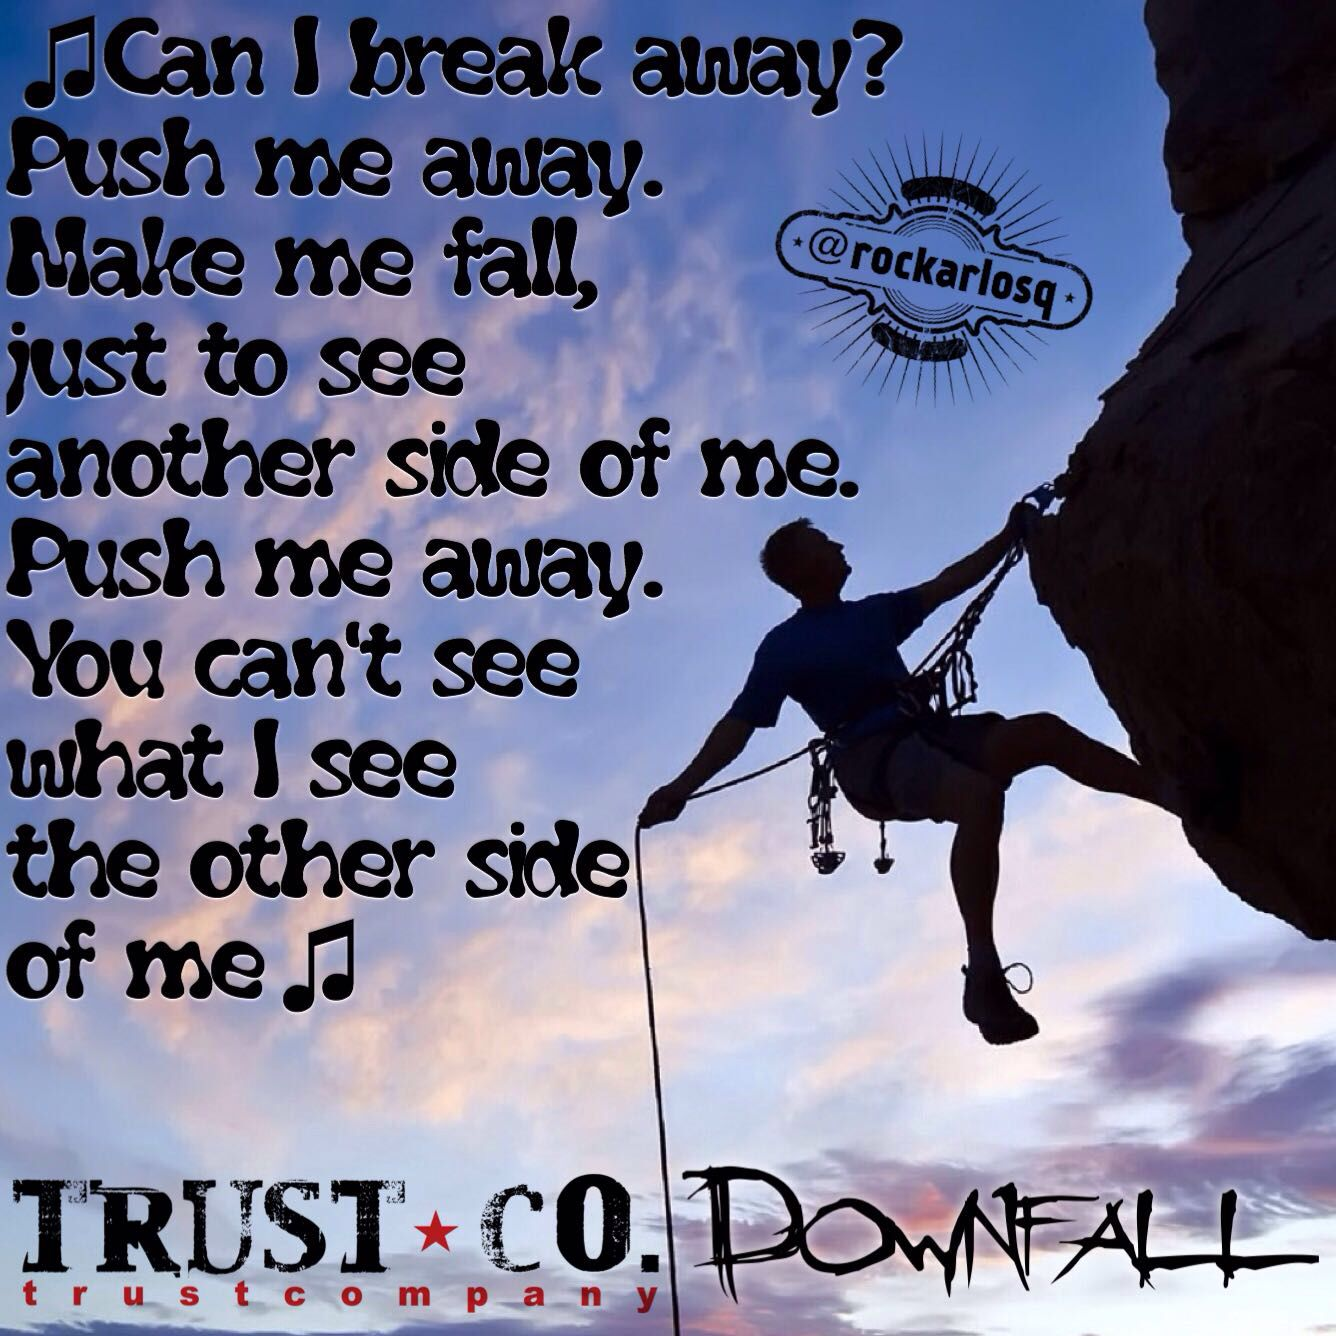 Can I break away Push me away Make me fall Just to see